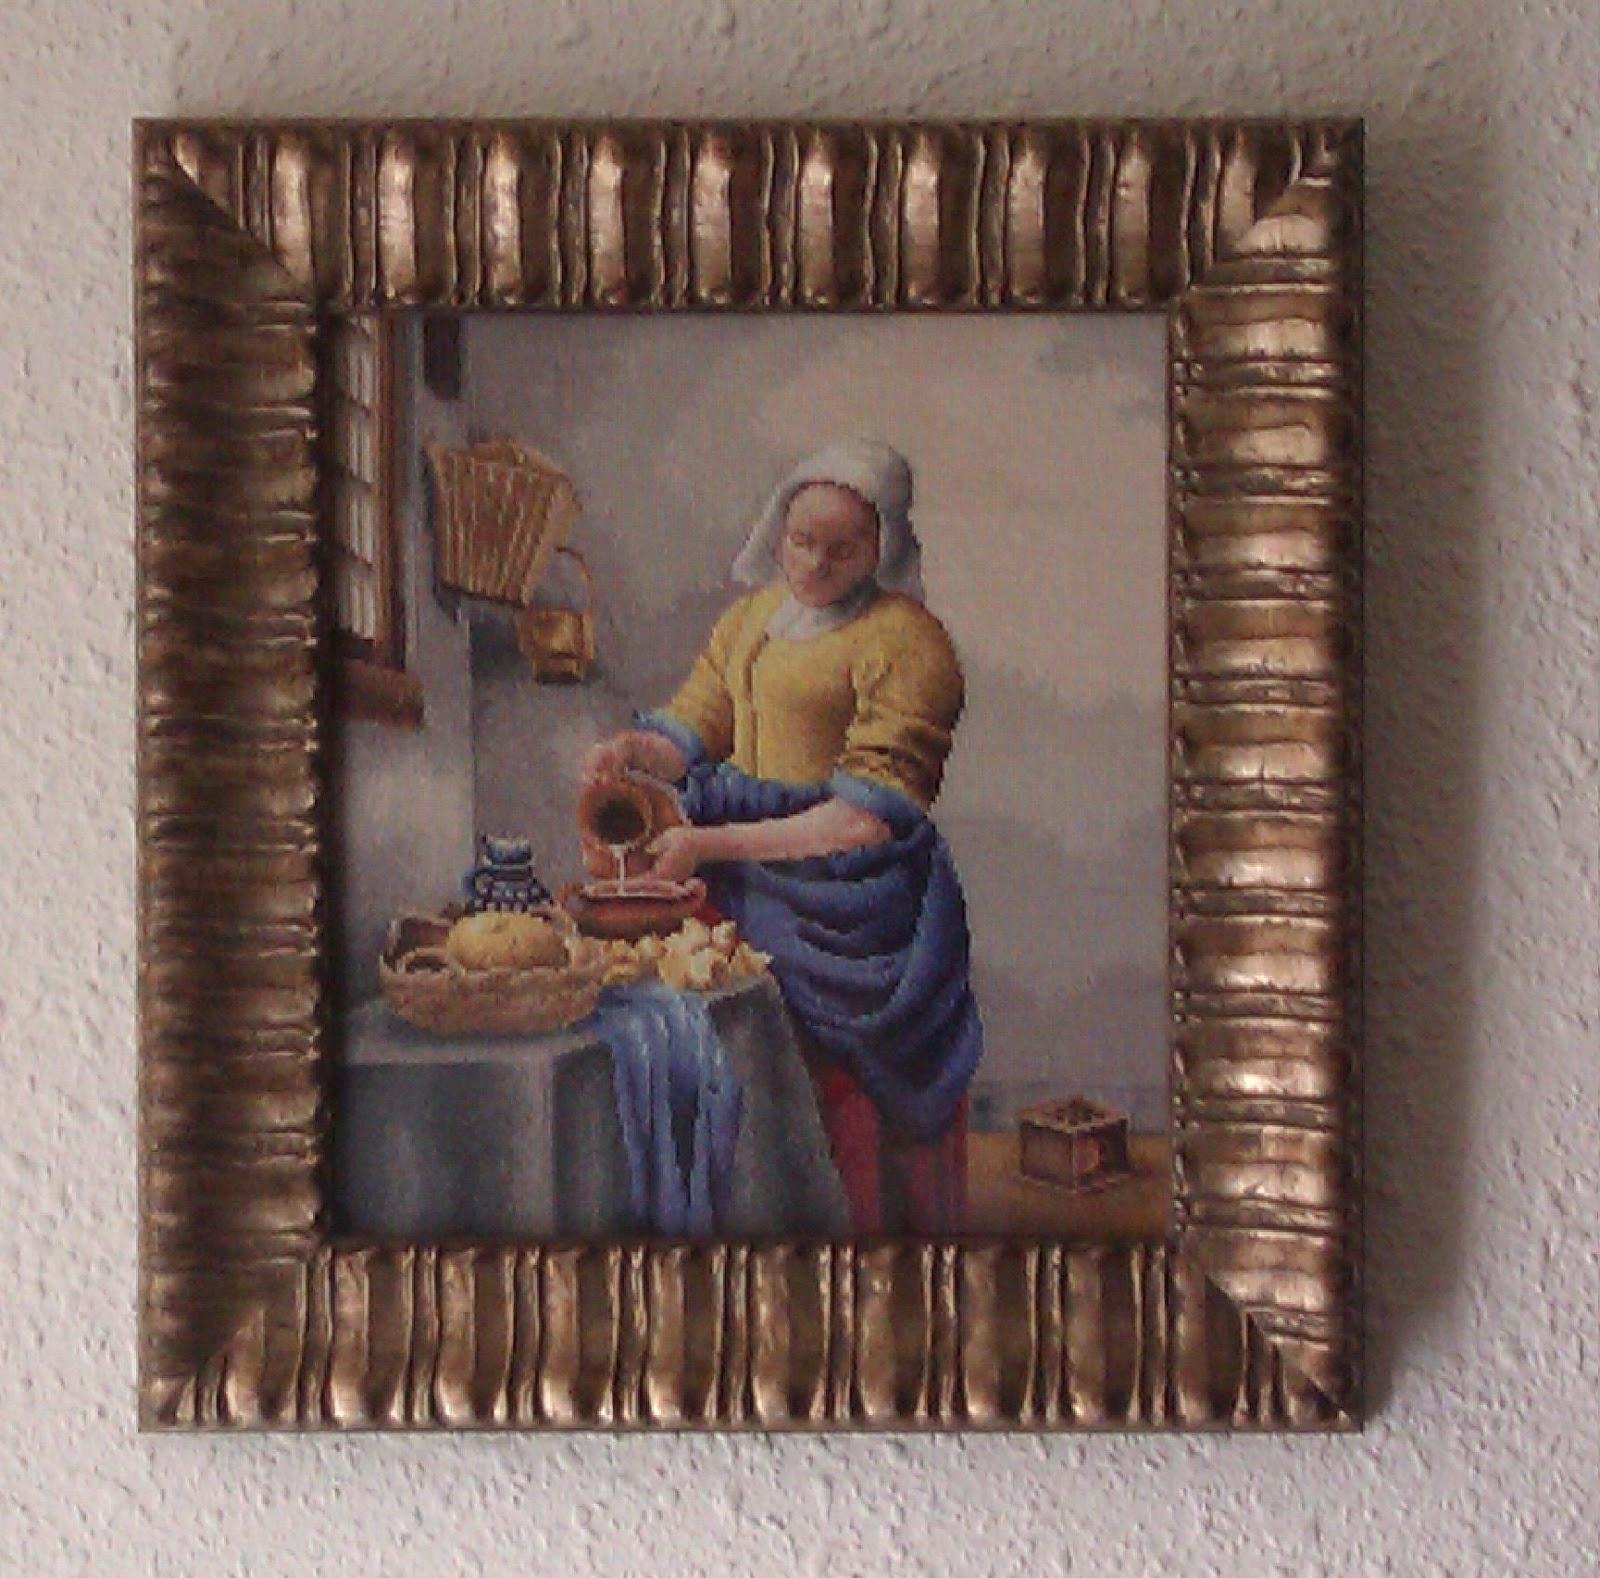 Carmen garc a la lechera de vermeer - La lechera de vermeer ...